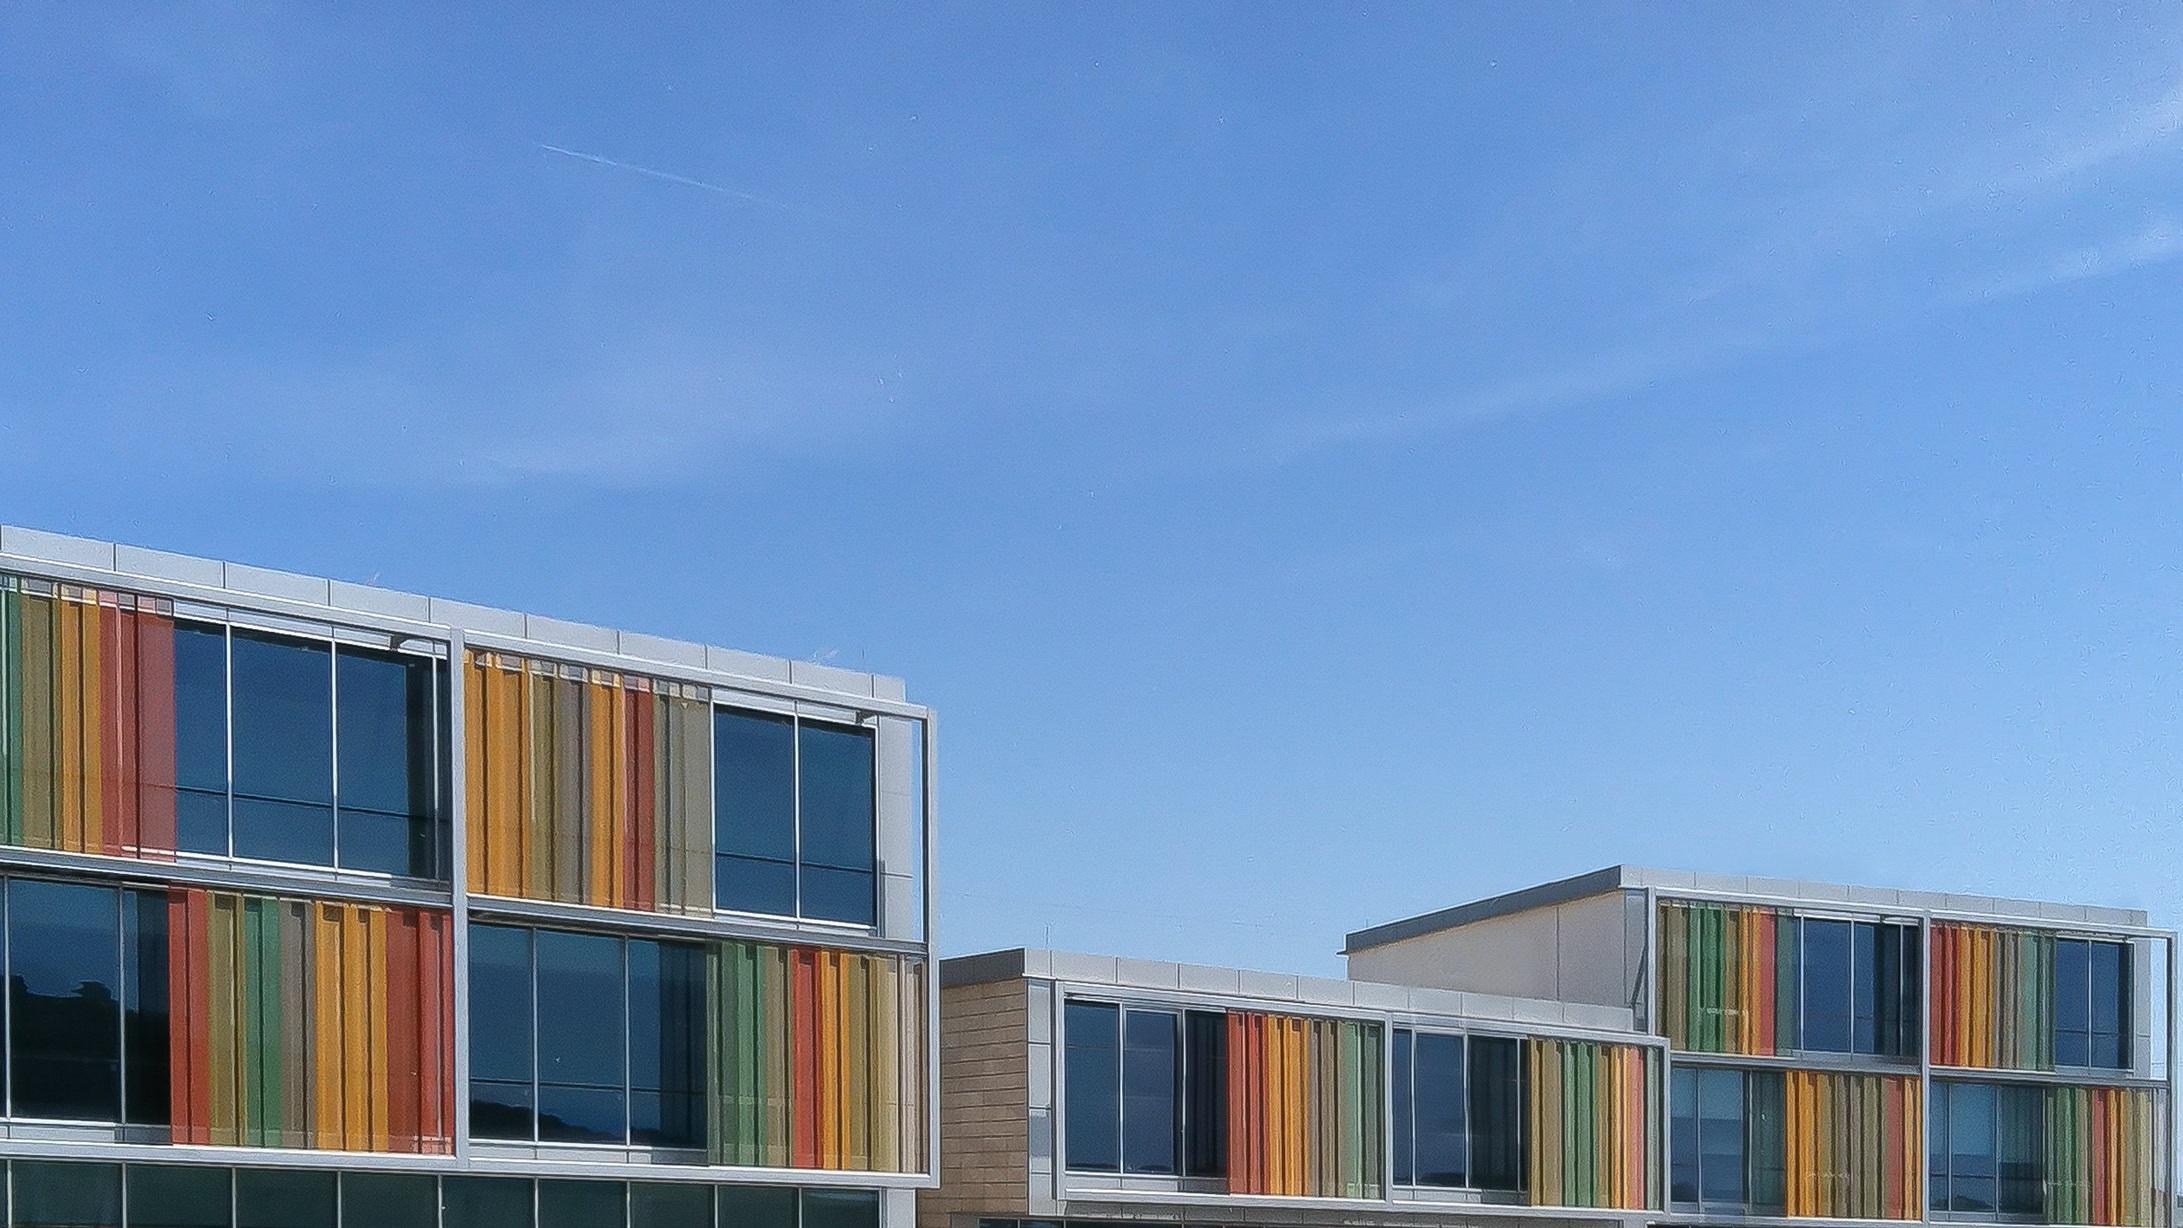 OZU student center_exterior 3-2.jpg